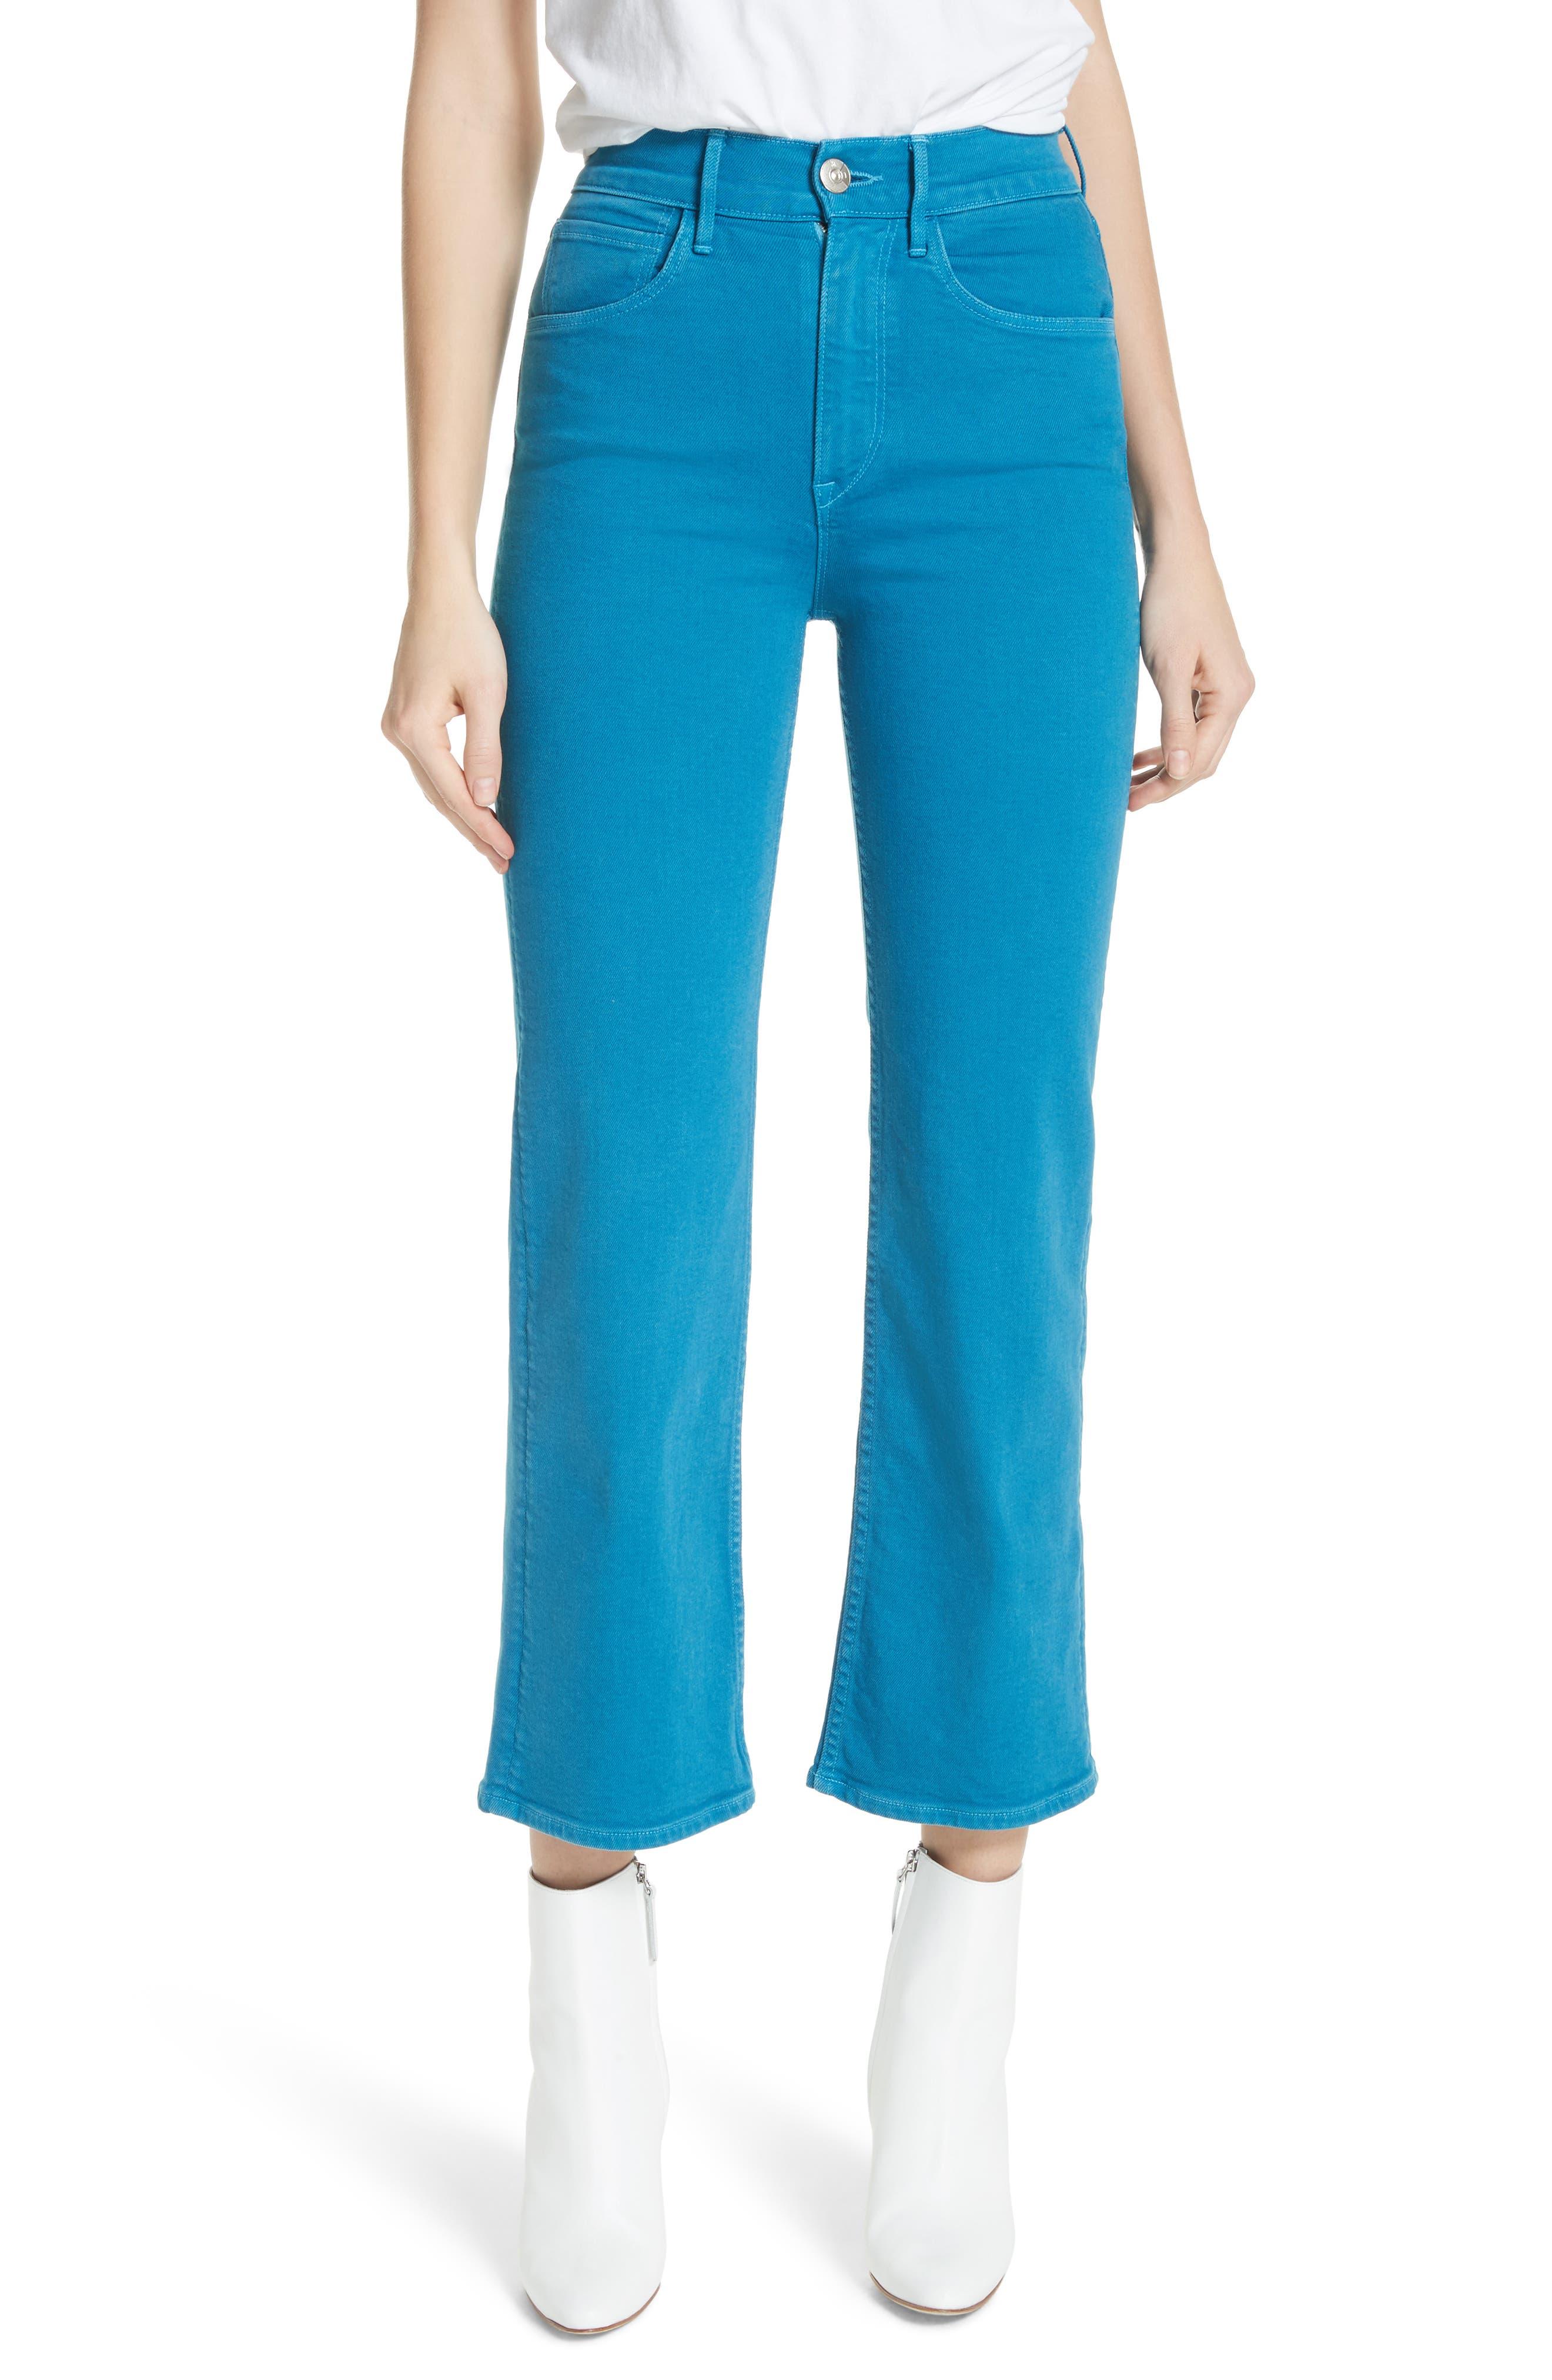 W4 Shelter Wide Leg Crop Jeans,                             Main thumbnail 1, color,                             Peacock Blue